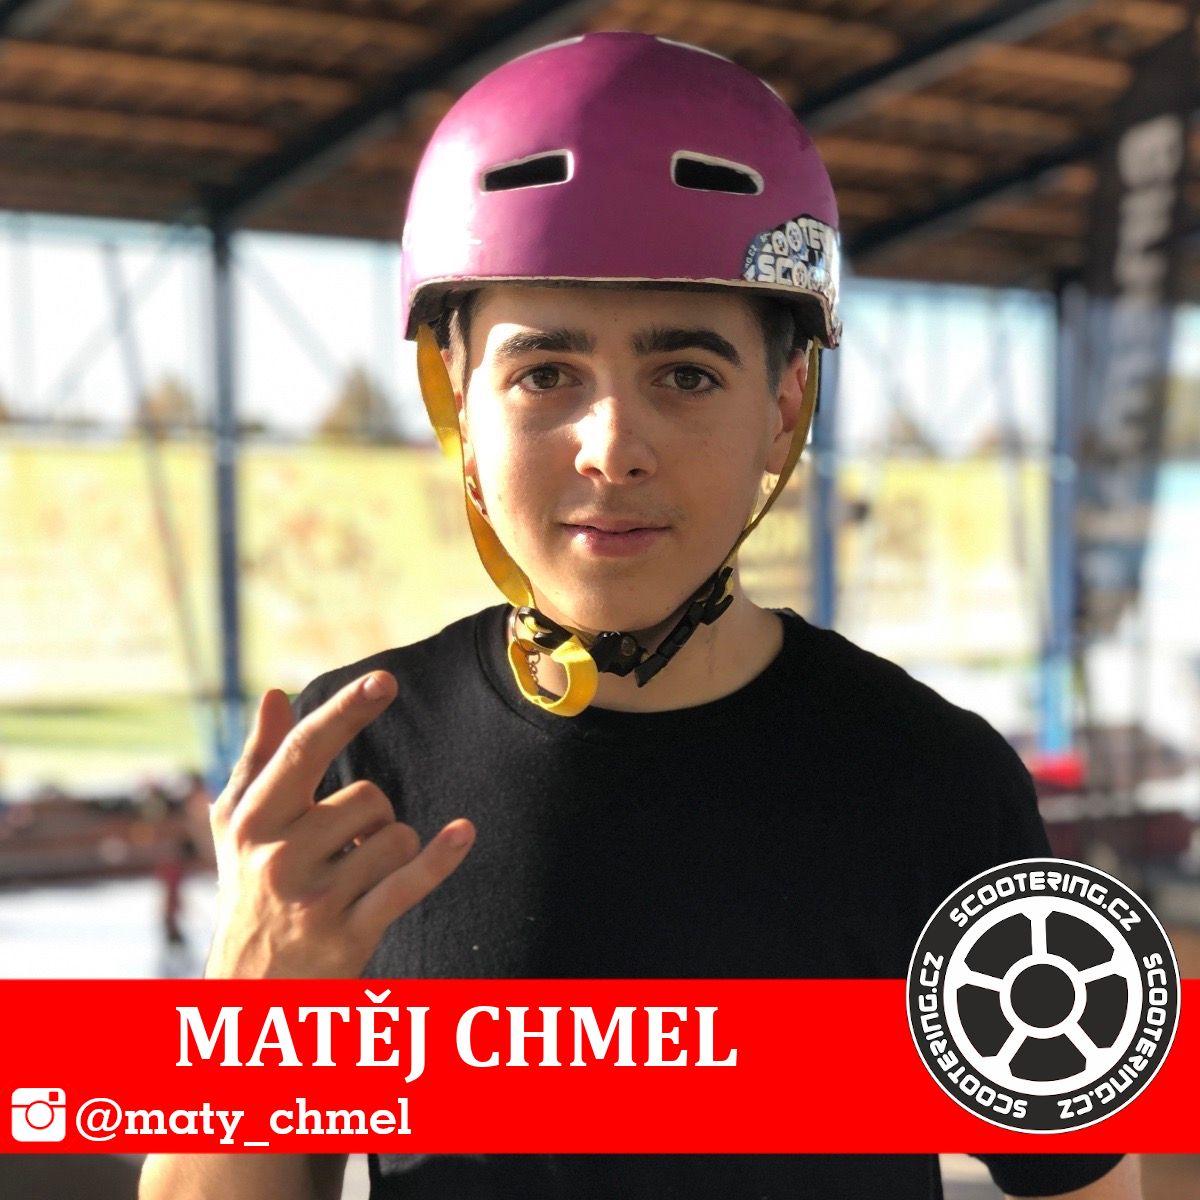 Maty Chmel